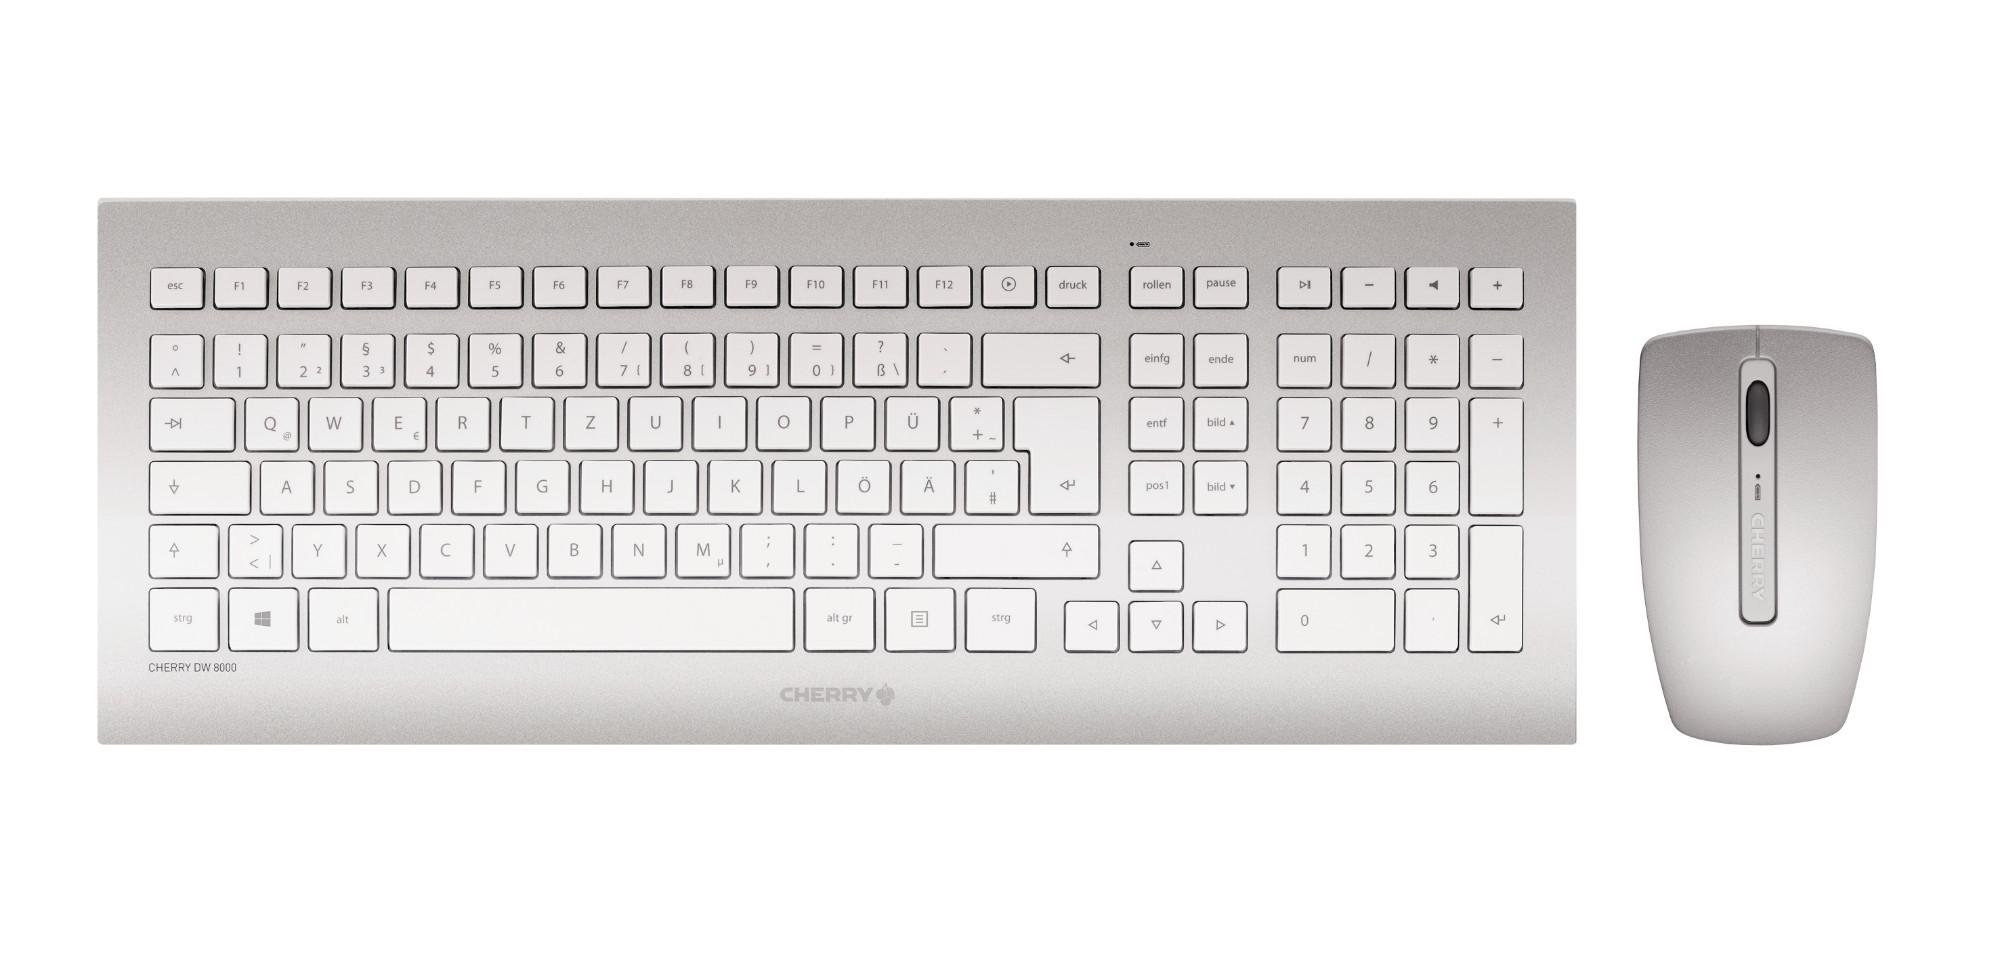 CHERRY DW 8000 keyboard RF Wireless QWERTY US English Silver, White